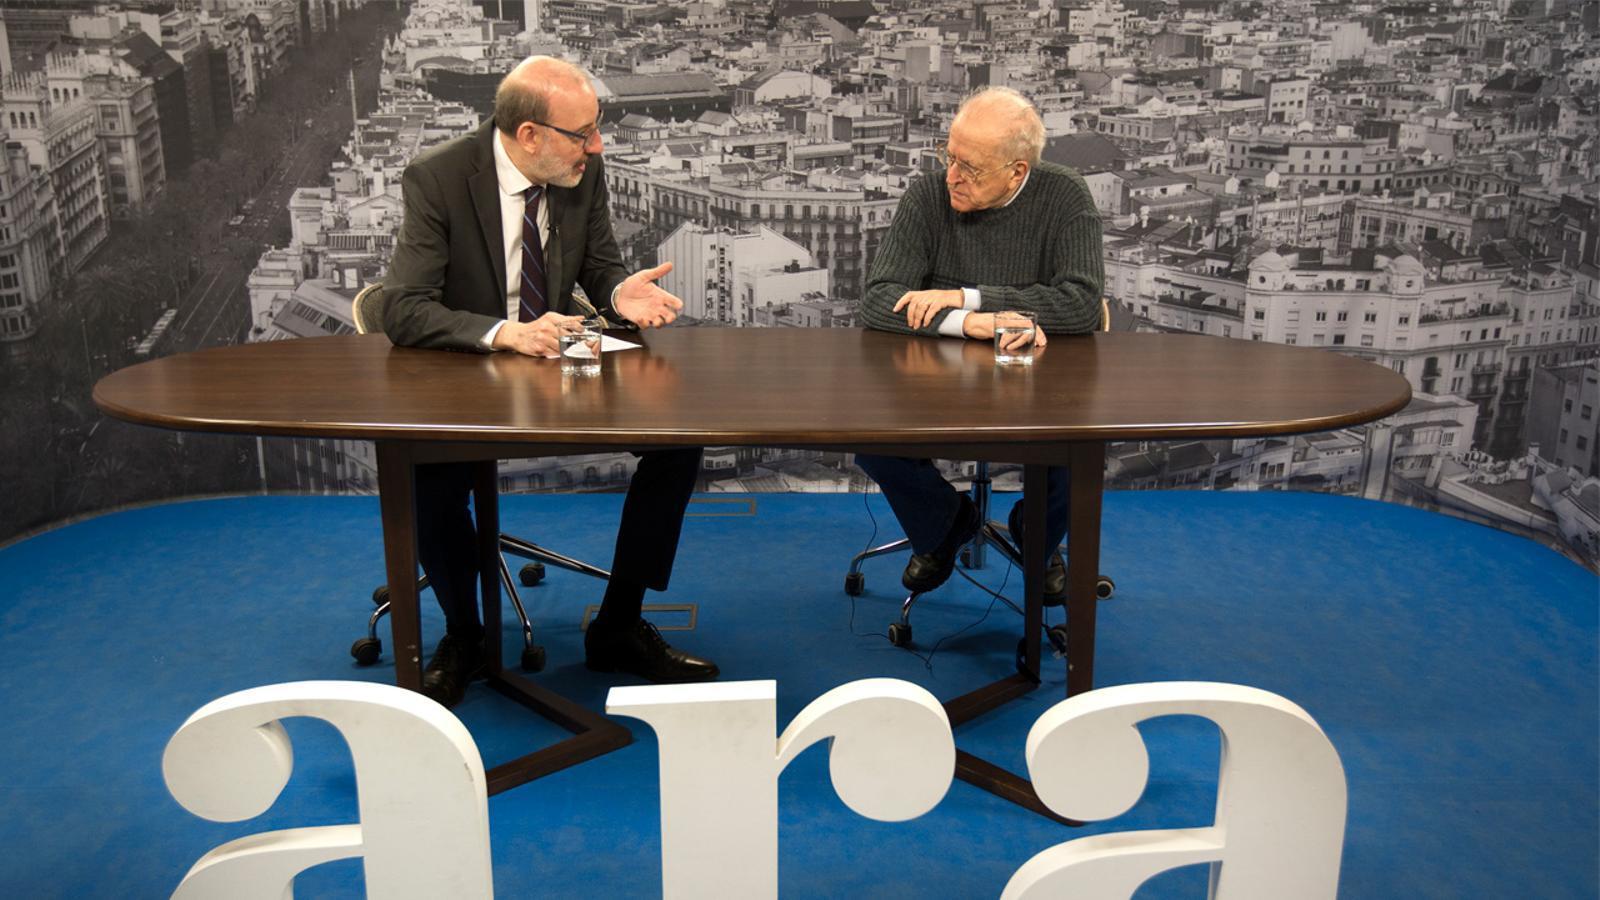 Entrevista d'Antoni Bassas a José Martí Gómez